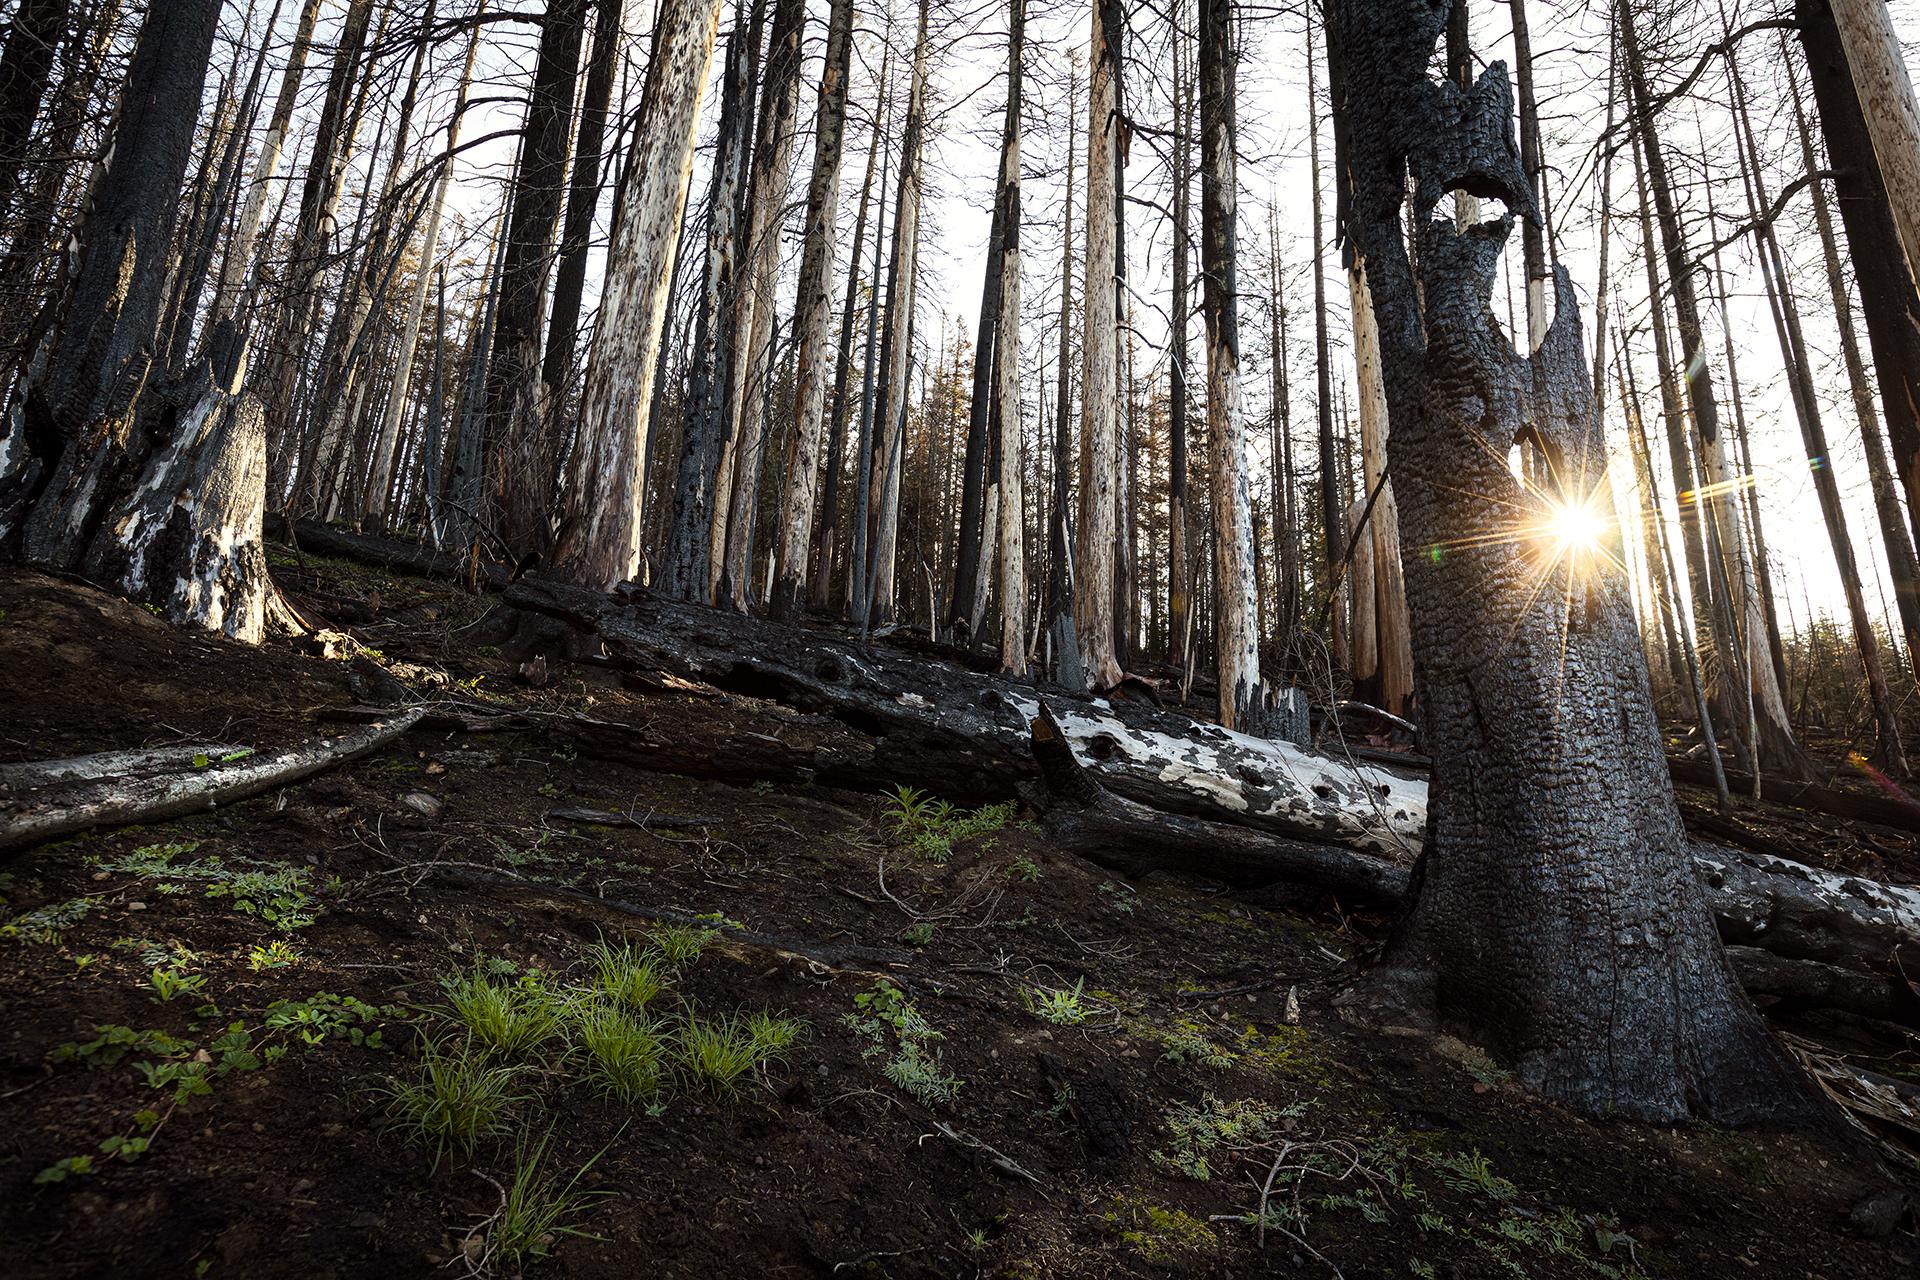 Norse Fire sunburst through trees